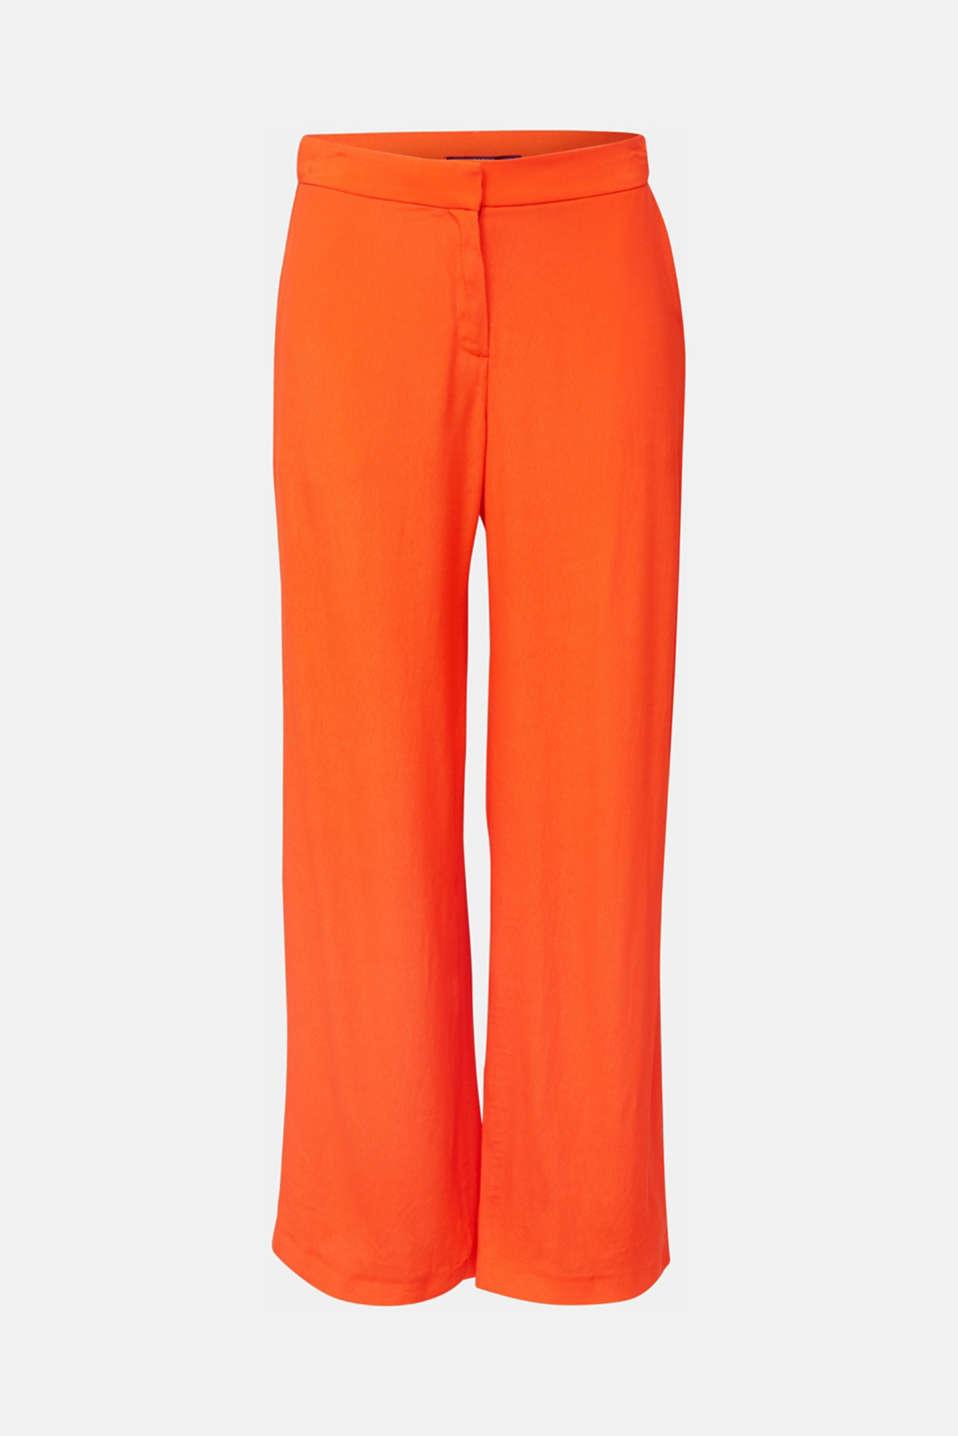 Crêpe trousers, LENZING™ ECOVERO™, RED ORANGE, detail image number 7